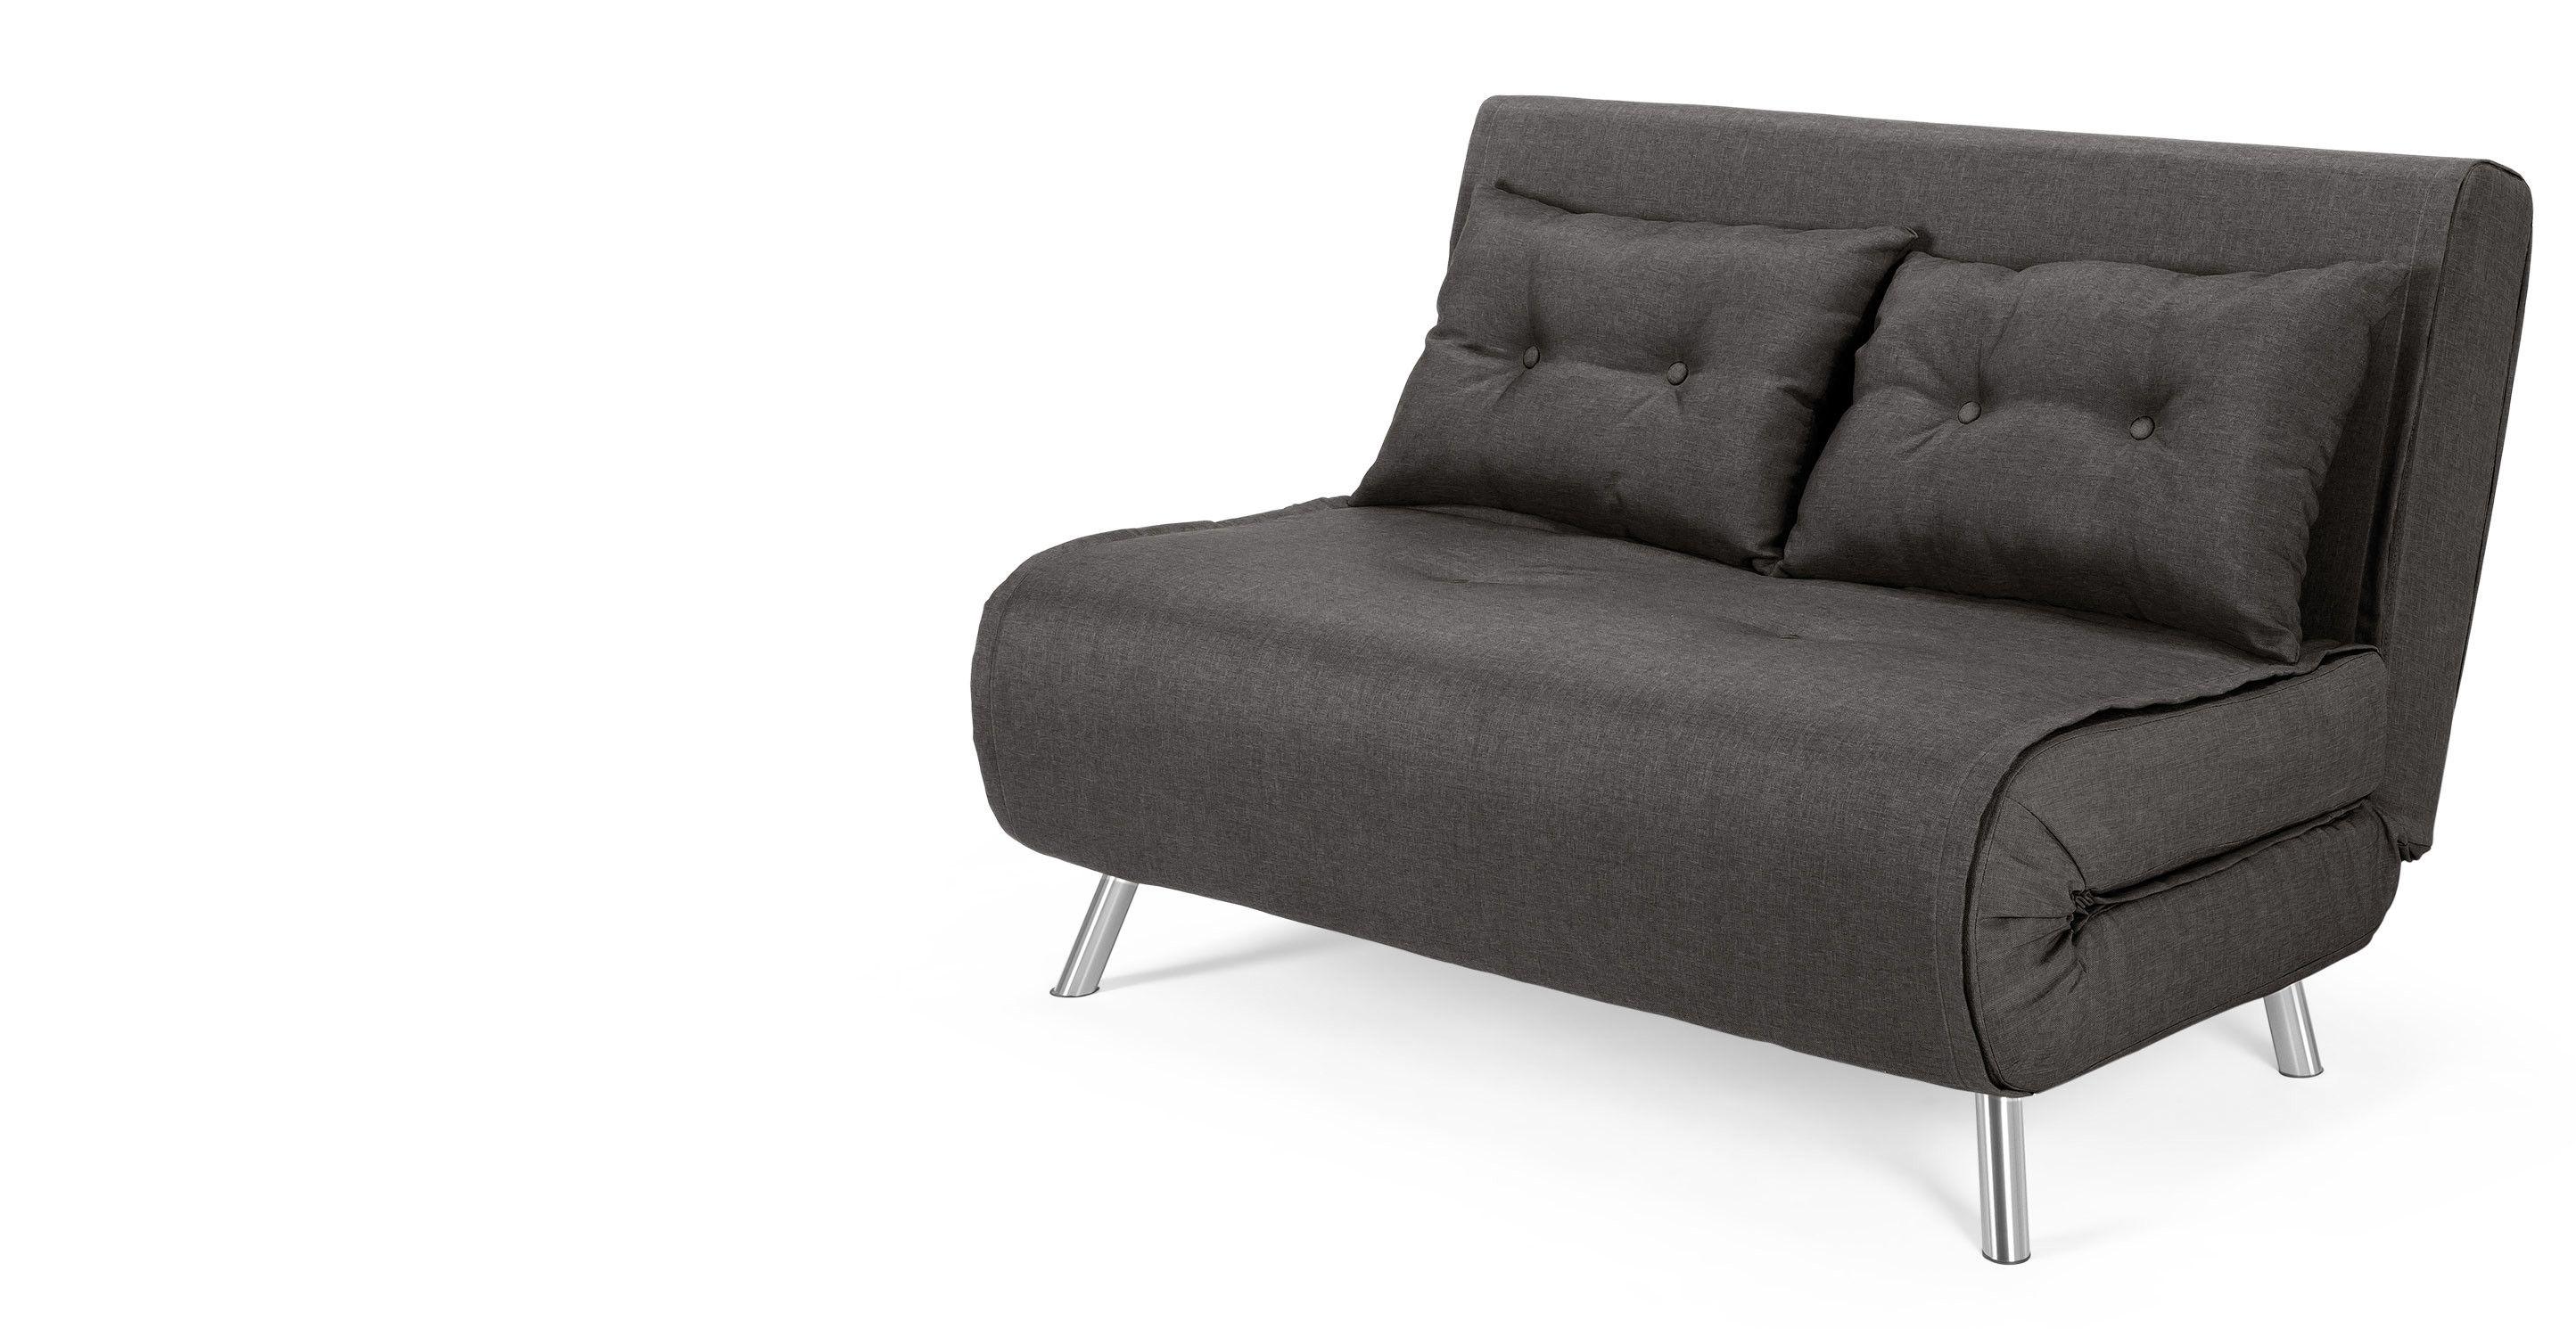 Haru Small Sofa Bed Cygnet Grey Slaapbank Kleine Bank Bed Maten